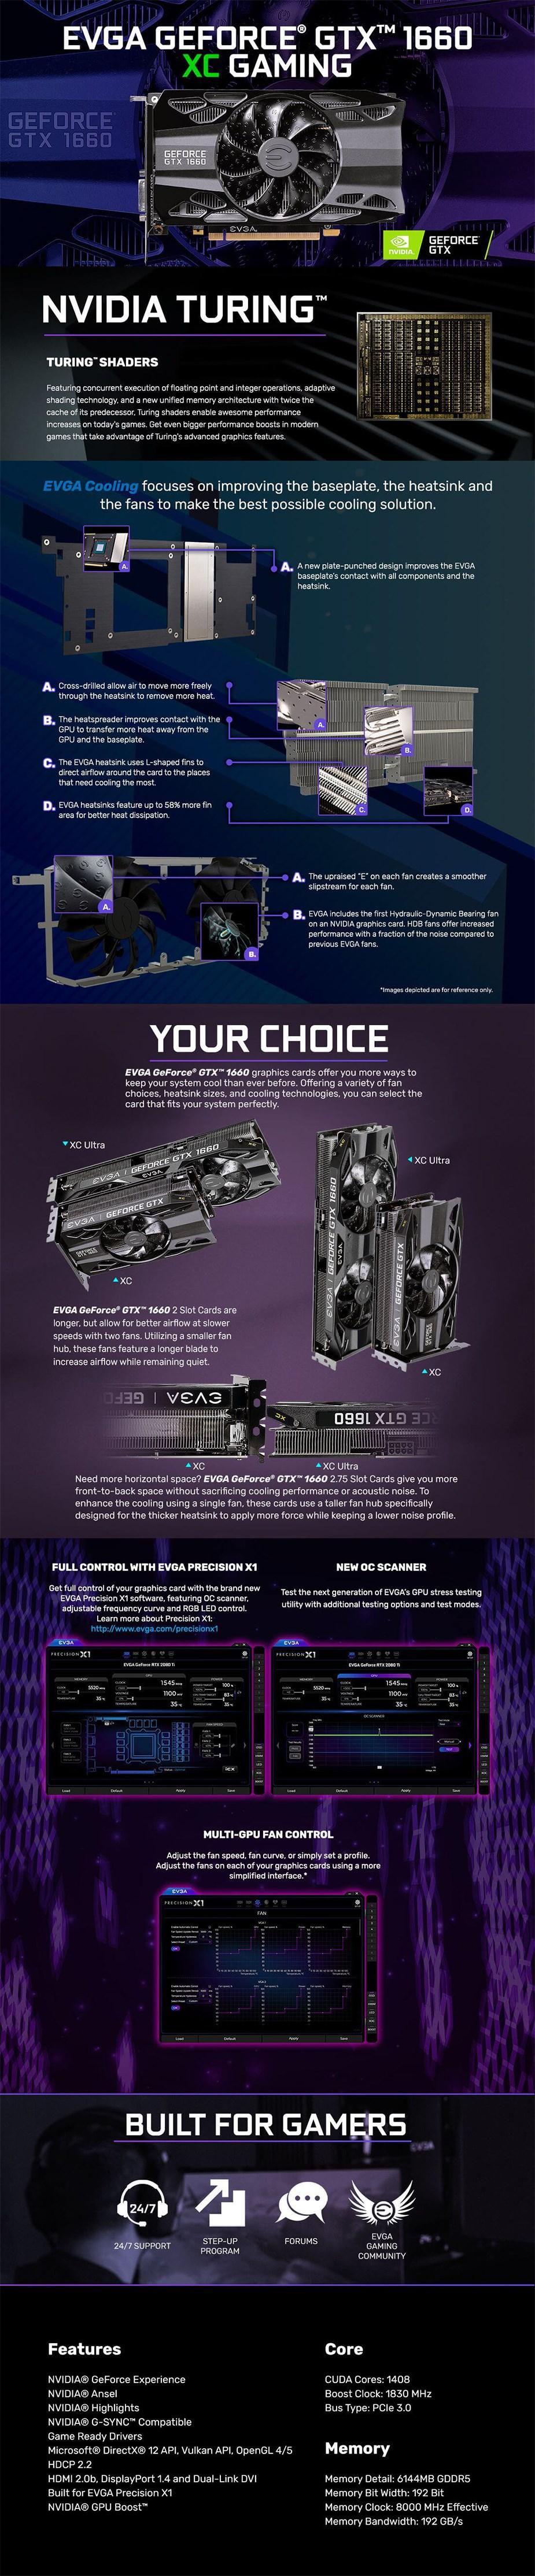 EVGA GeForce GTX 1660 XC GAMING 6GB Video Card - Desktop Overview 1